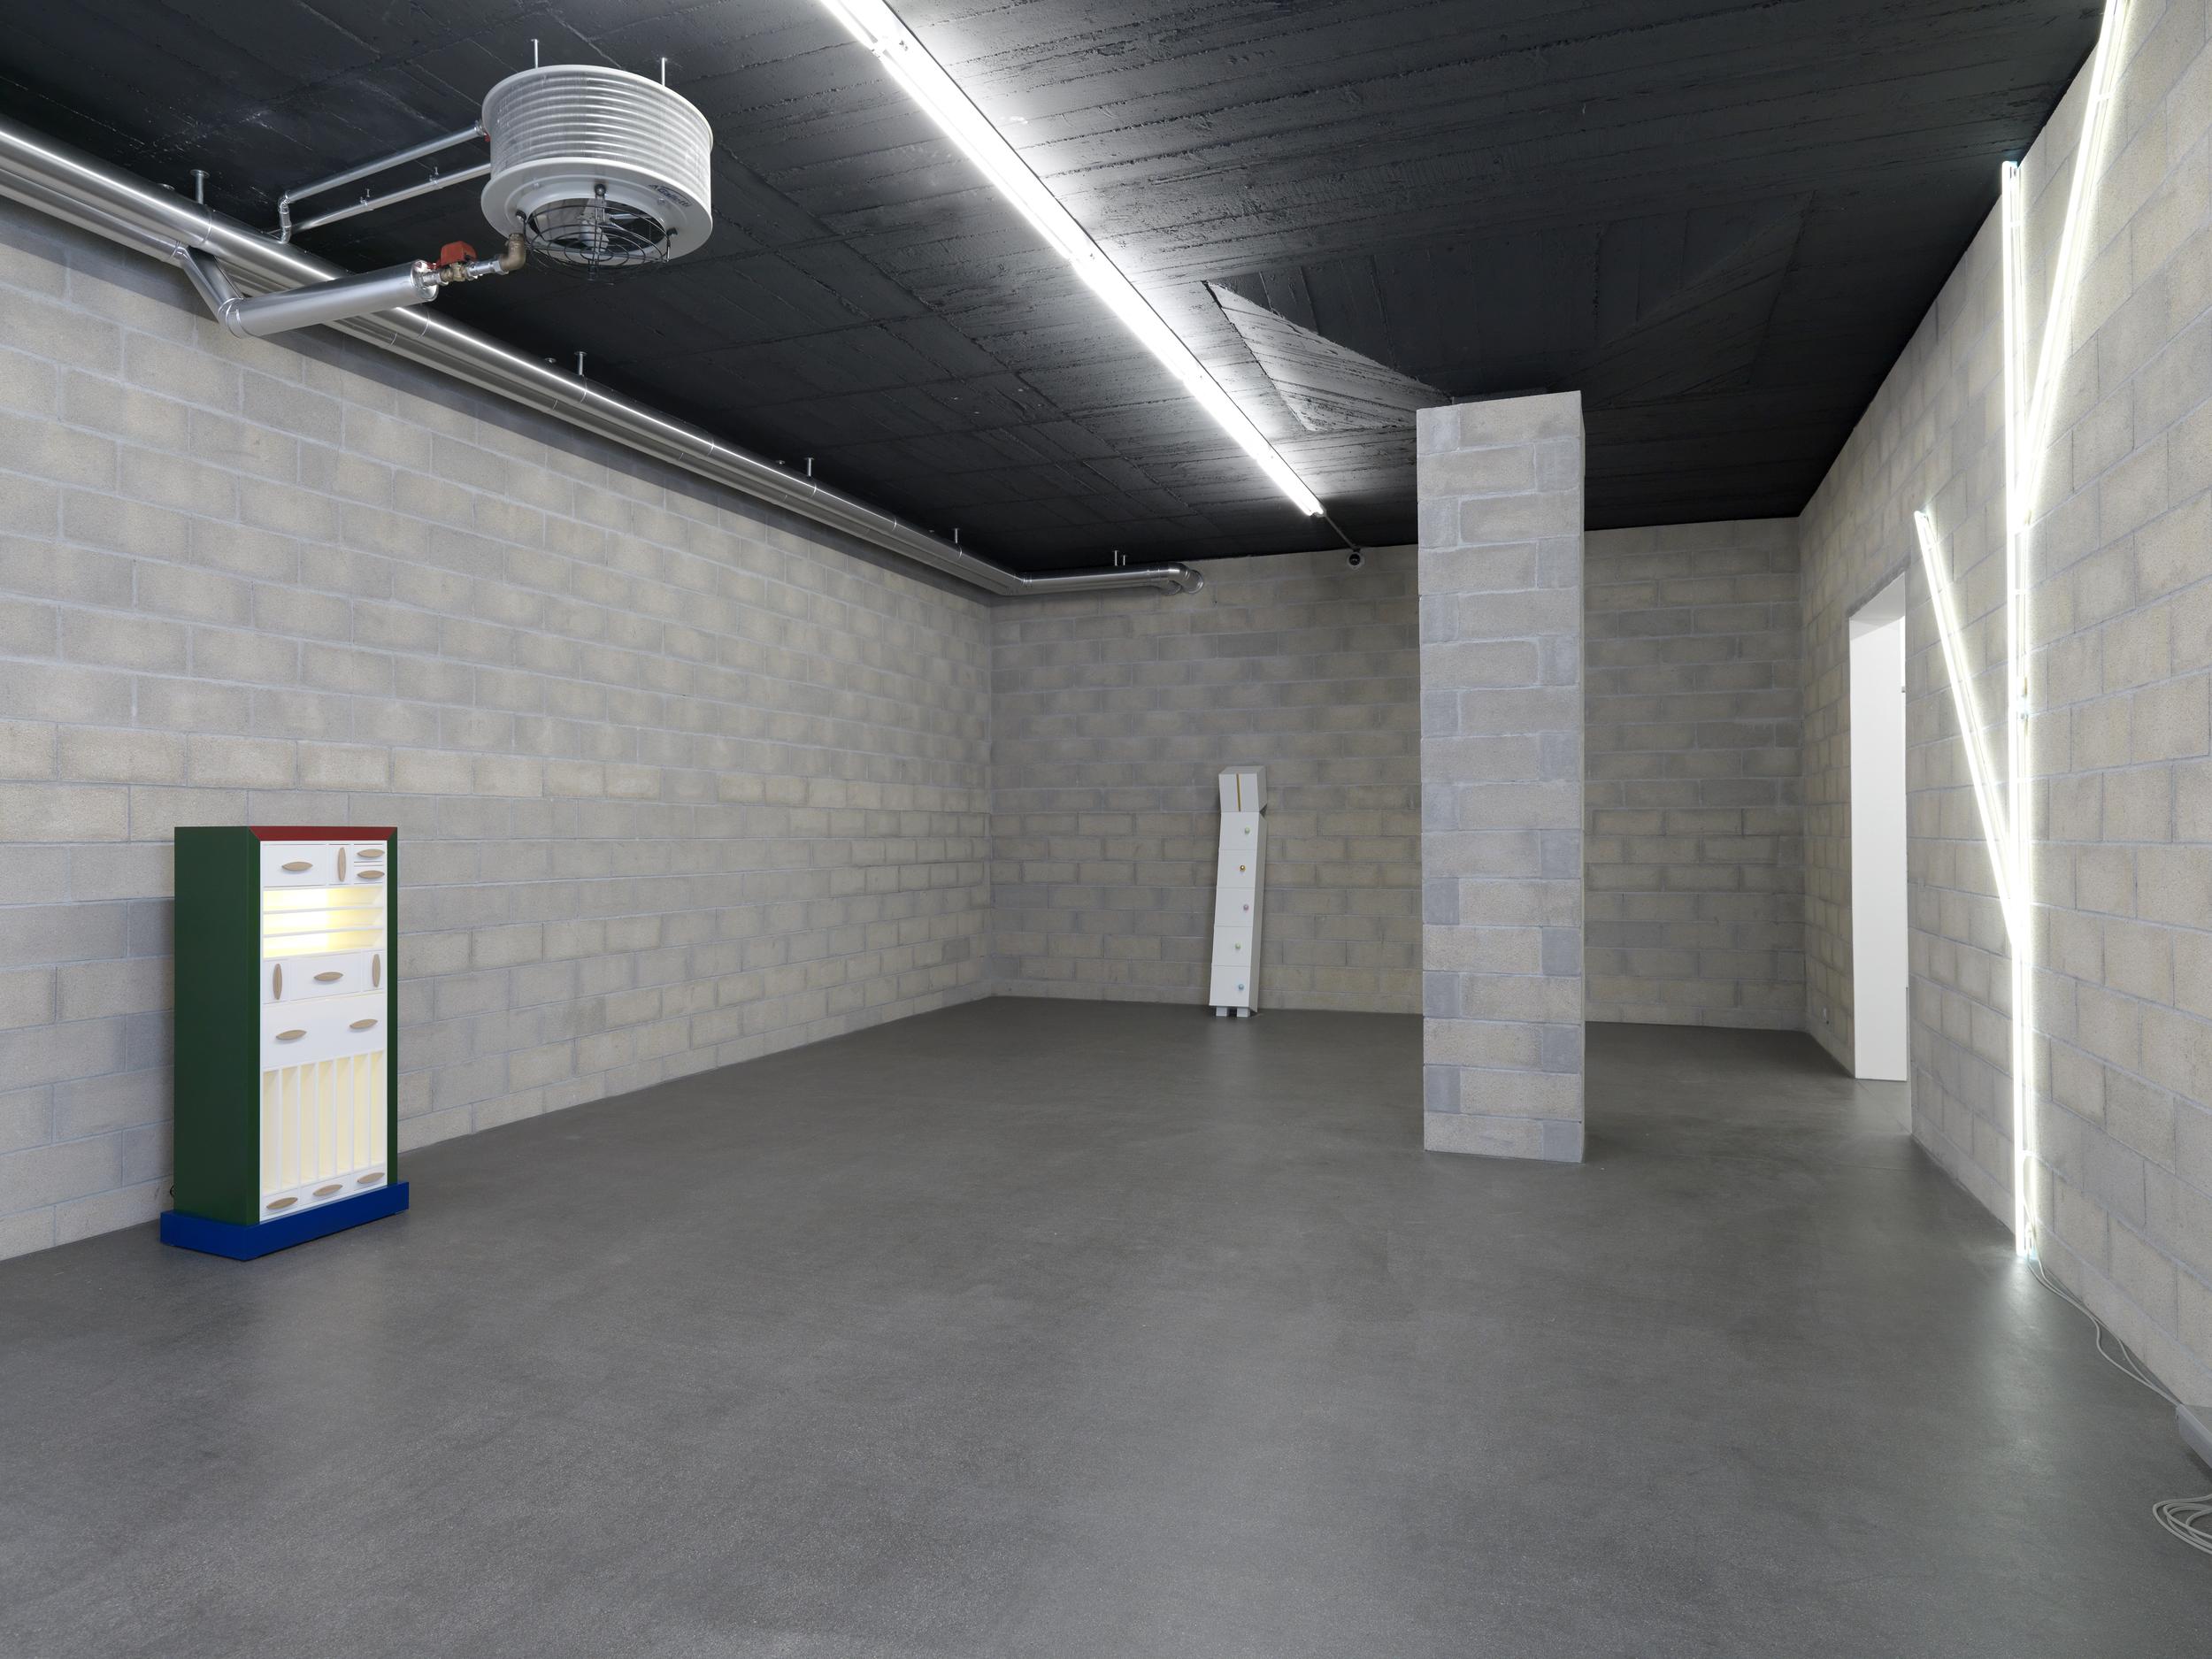 Fondation Speerstra, Apples - Martine Bedin & Mai-Thu Perret - 2014